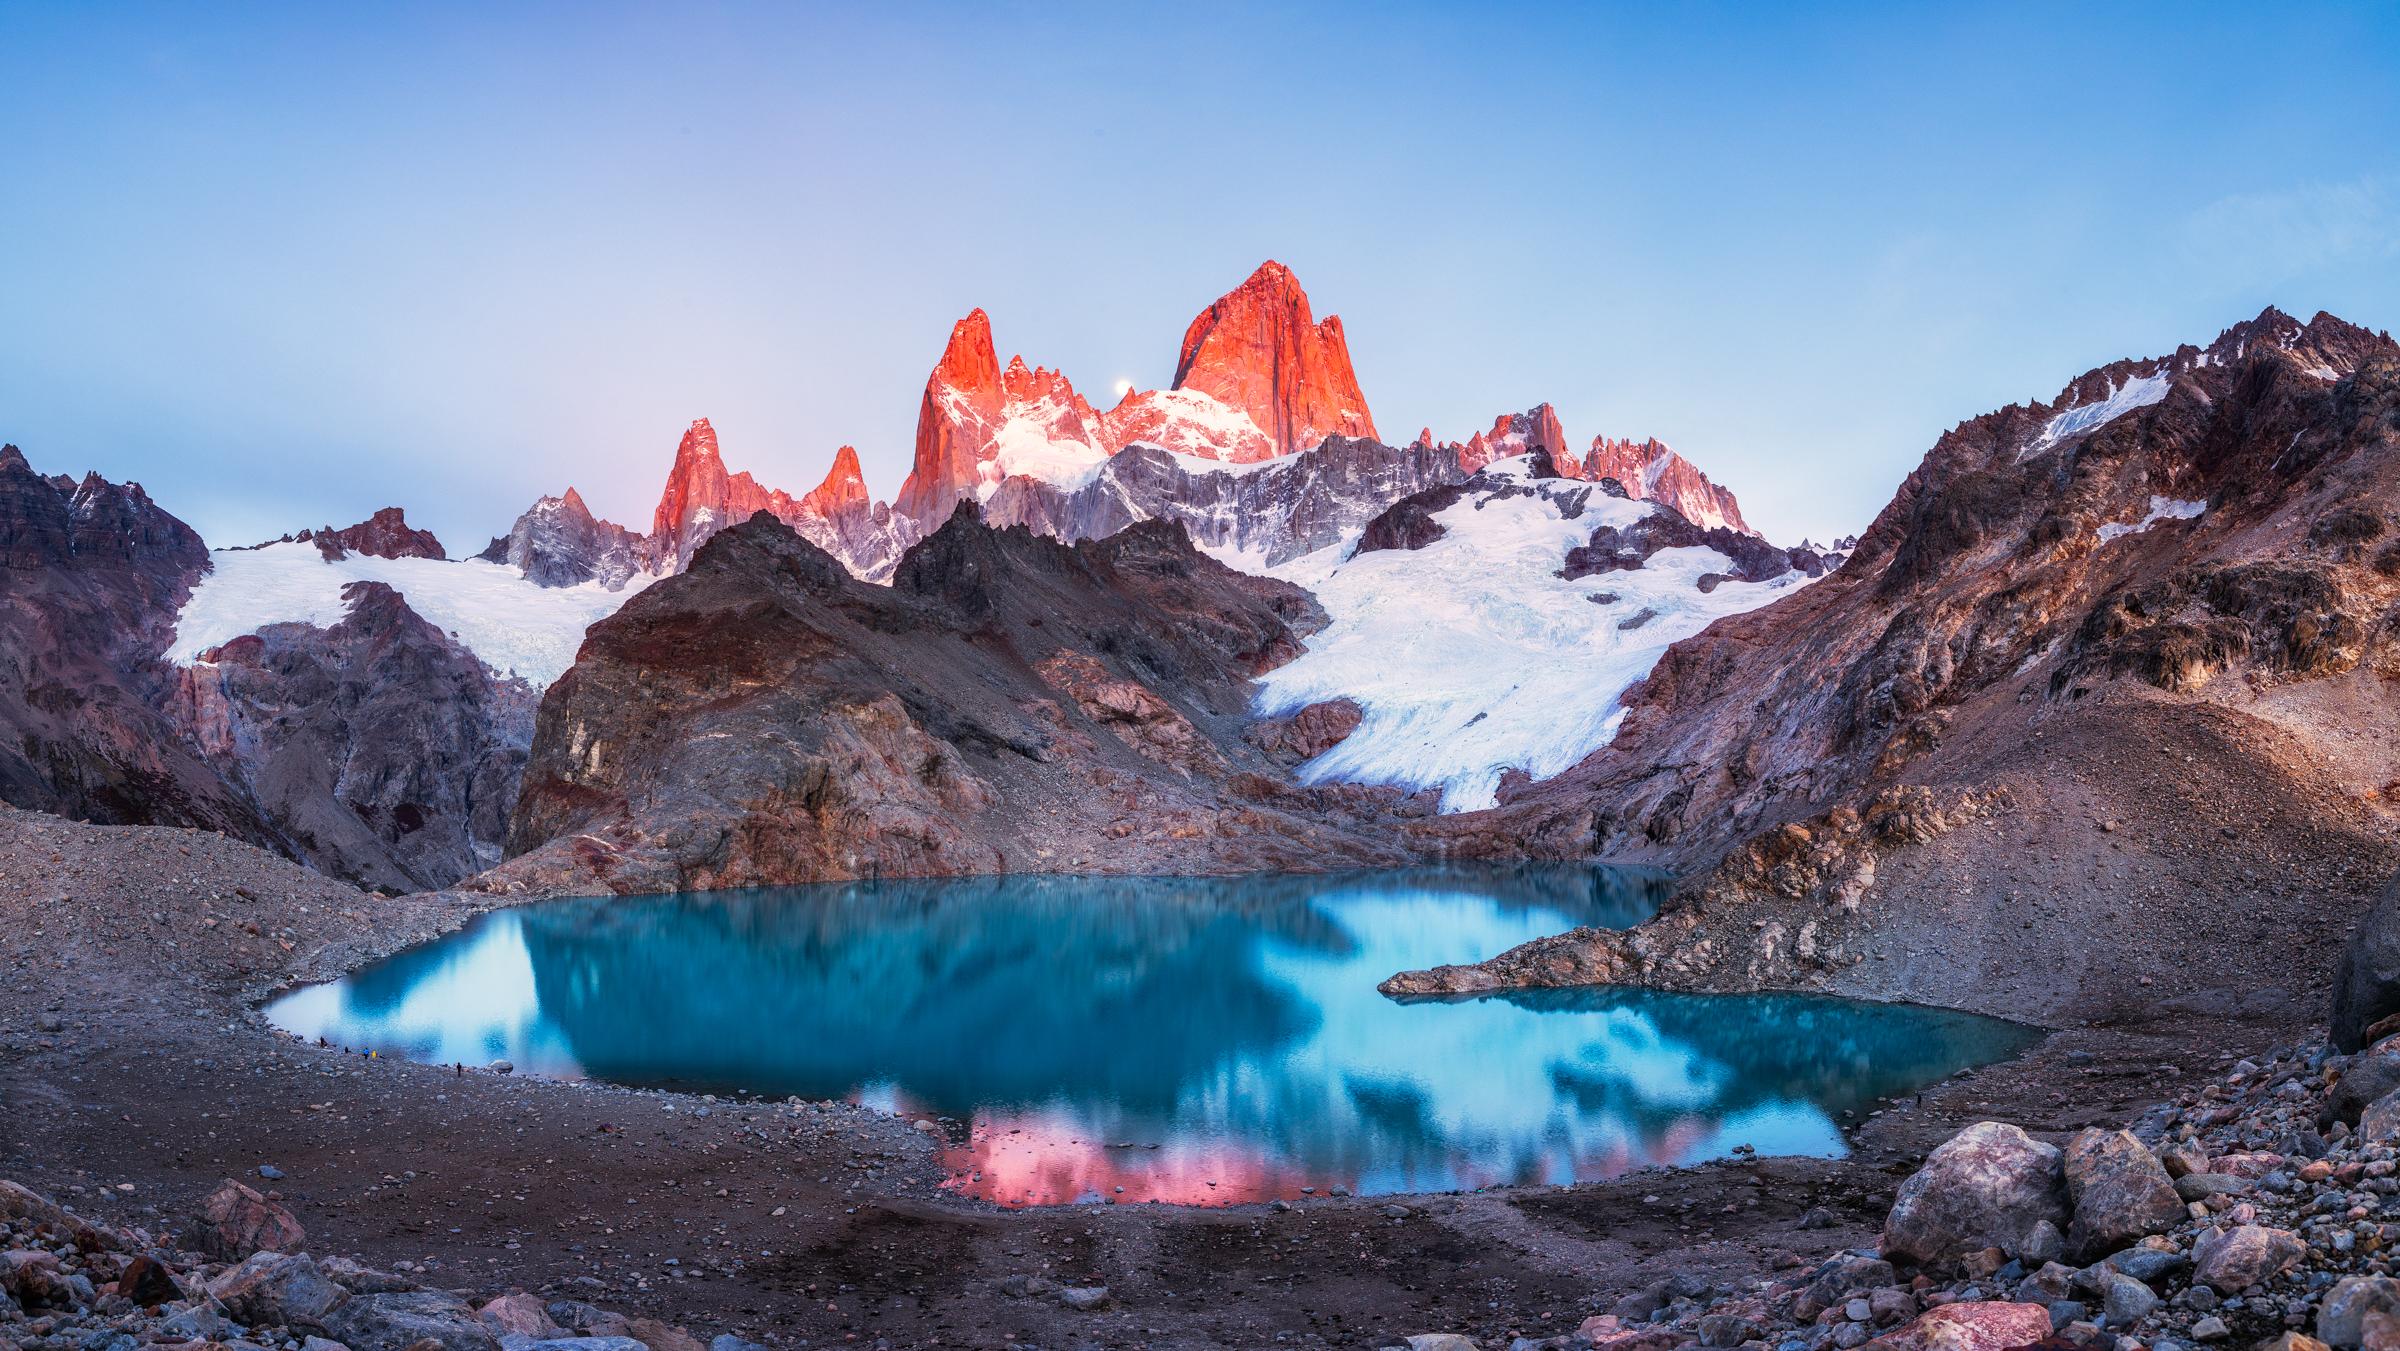 Lago de los tres near fitz roy argentina by michael matti